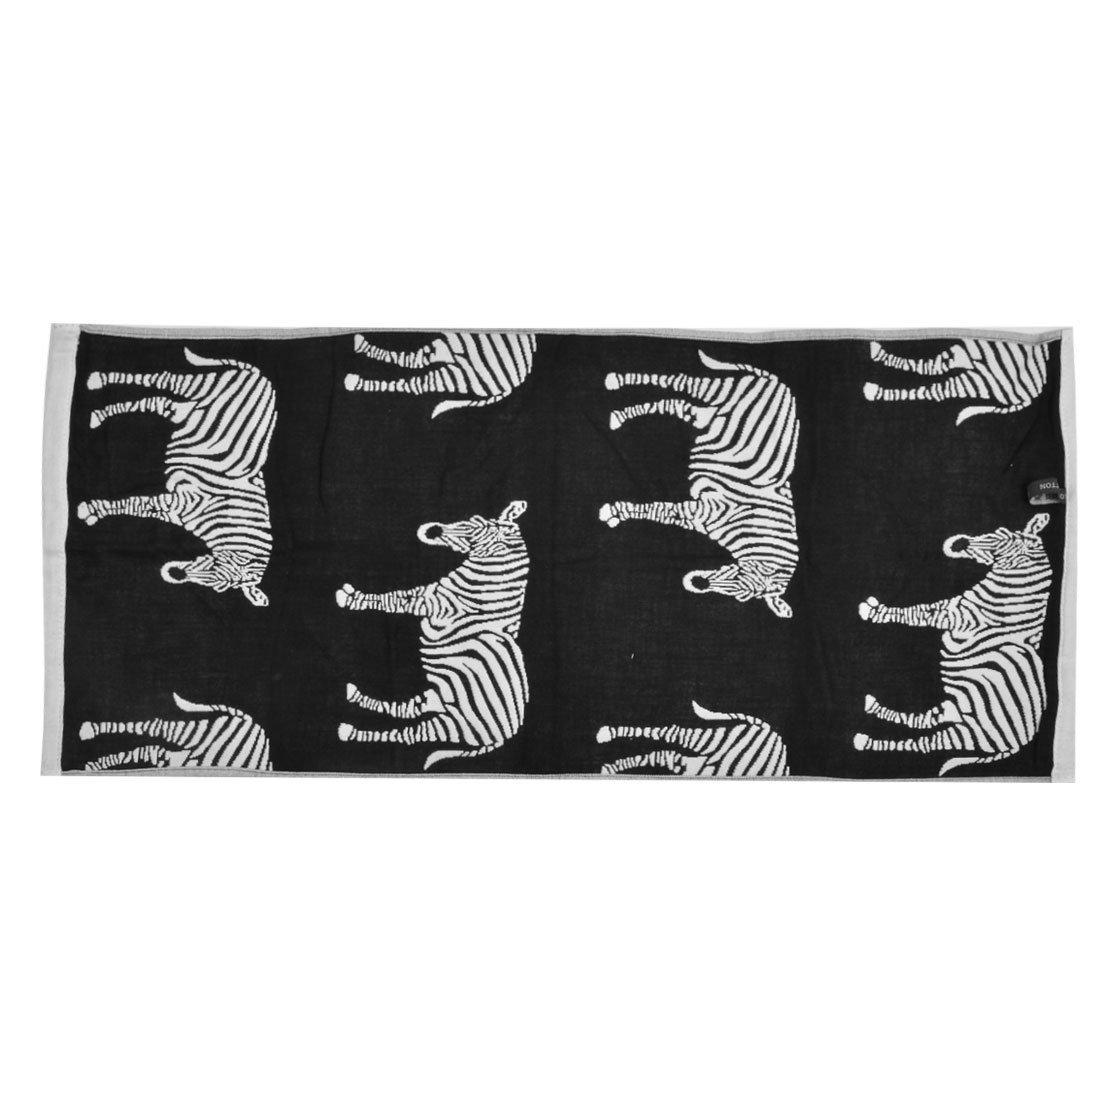 Amazon.com: eDealMax Mezclas del algodón patrón de cebra Inicio absorbencia Clean Lavado toalla de baño Toallita: Home & Kitchen